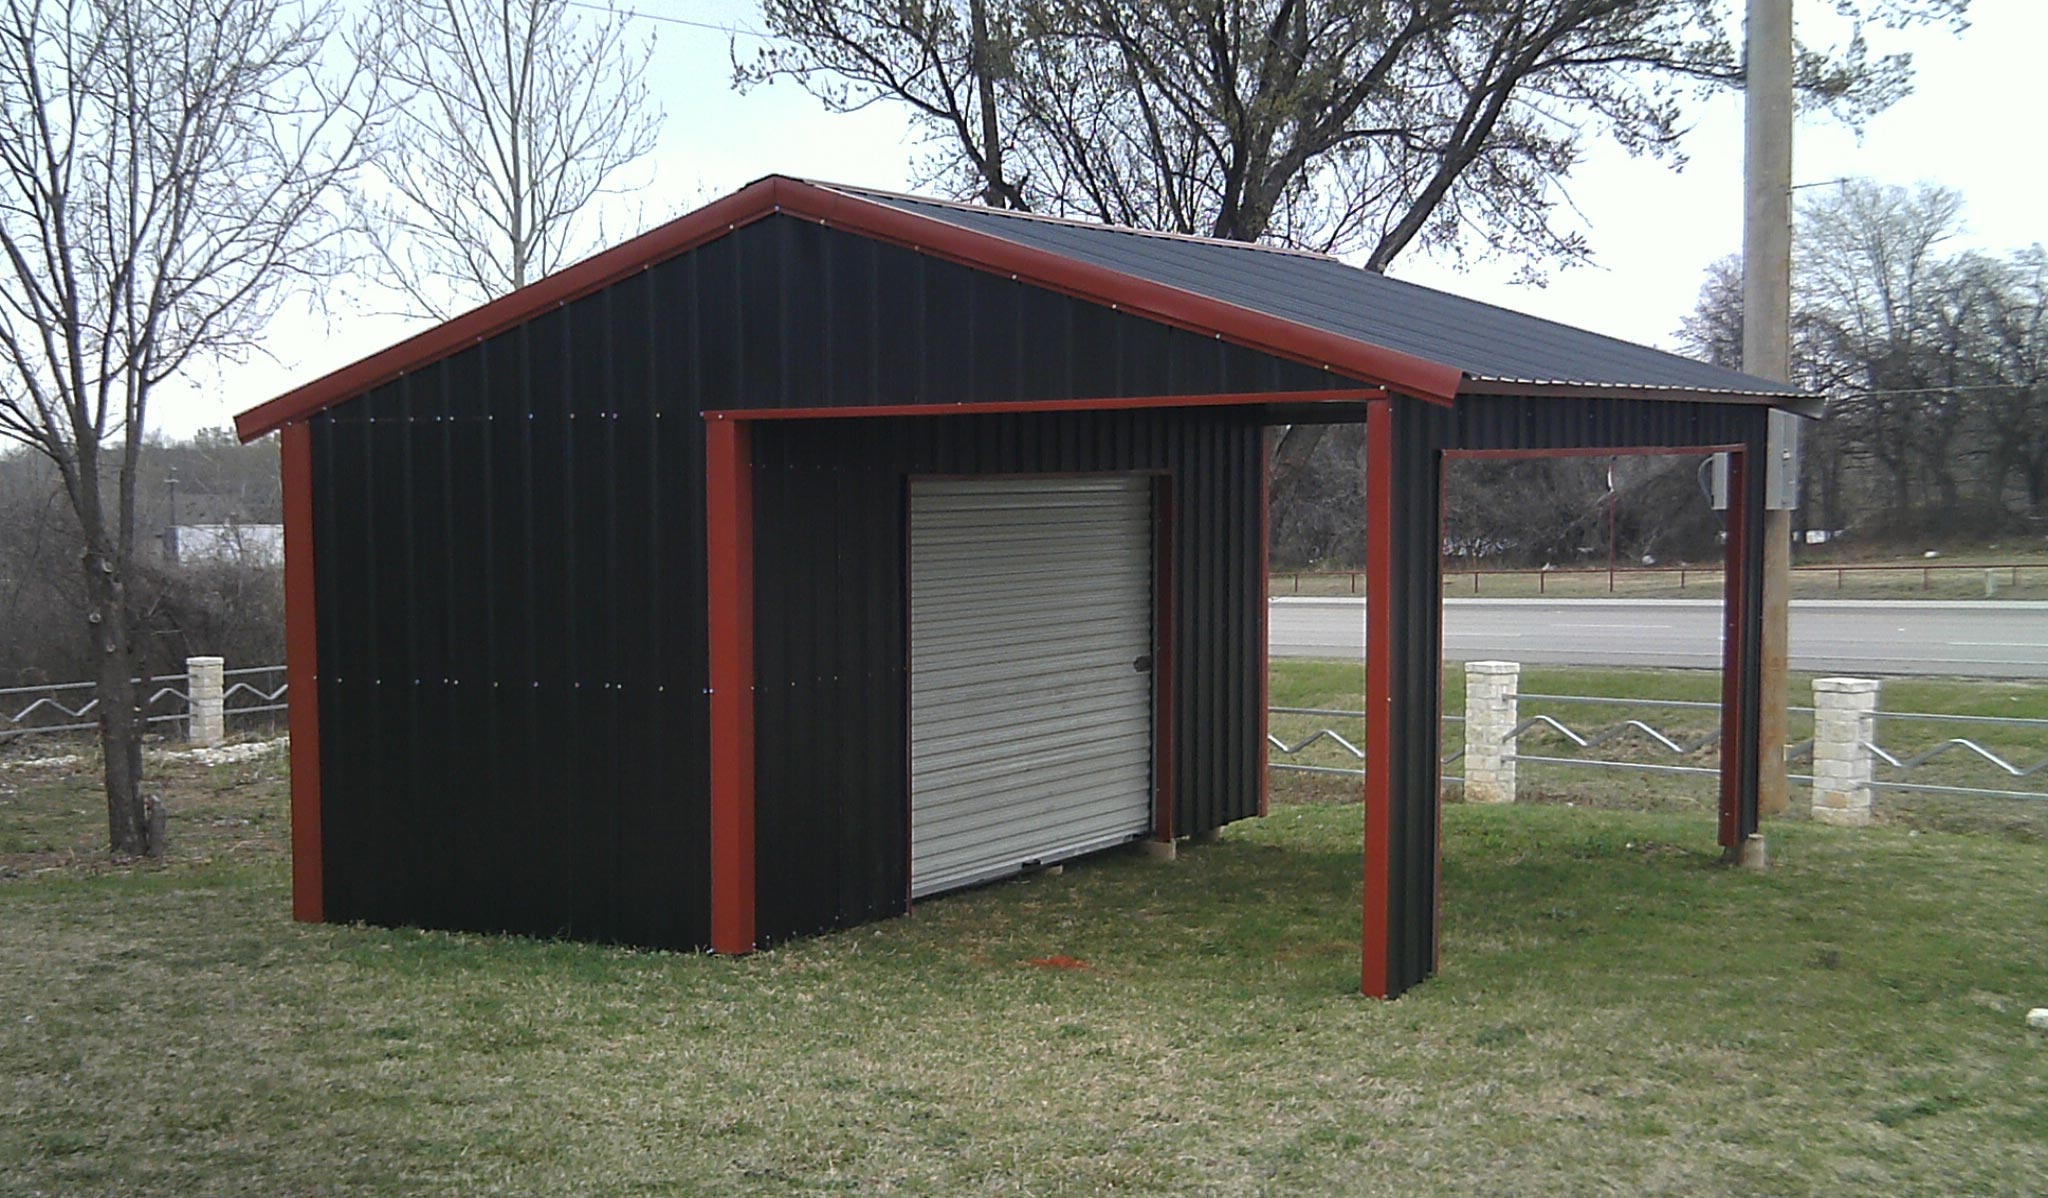 AMERICAN STEEL CARPORTS, INC. - Joshua, TX - Company Page